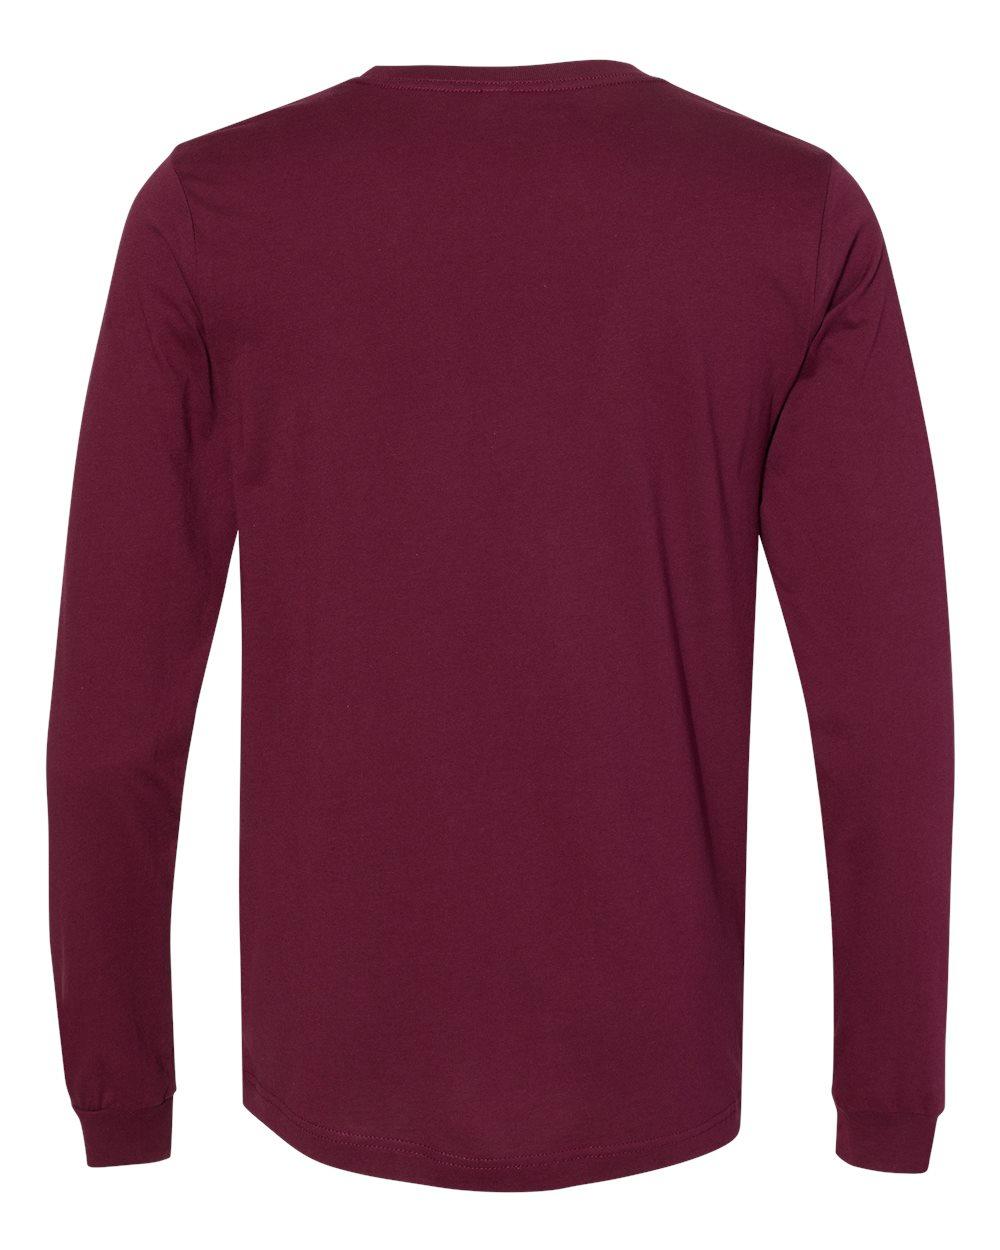 Bella-Canvas-Mens-Blank-Top-Long-Sleeve-Jersey-Tee-T-Shirt-3501-up-to-3XL thumbnail 77